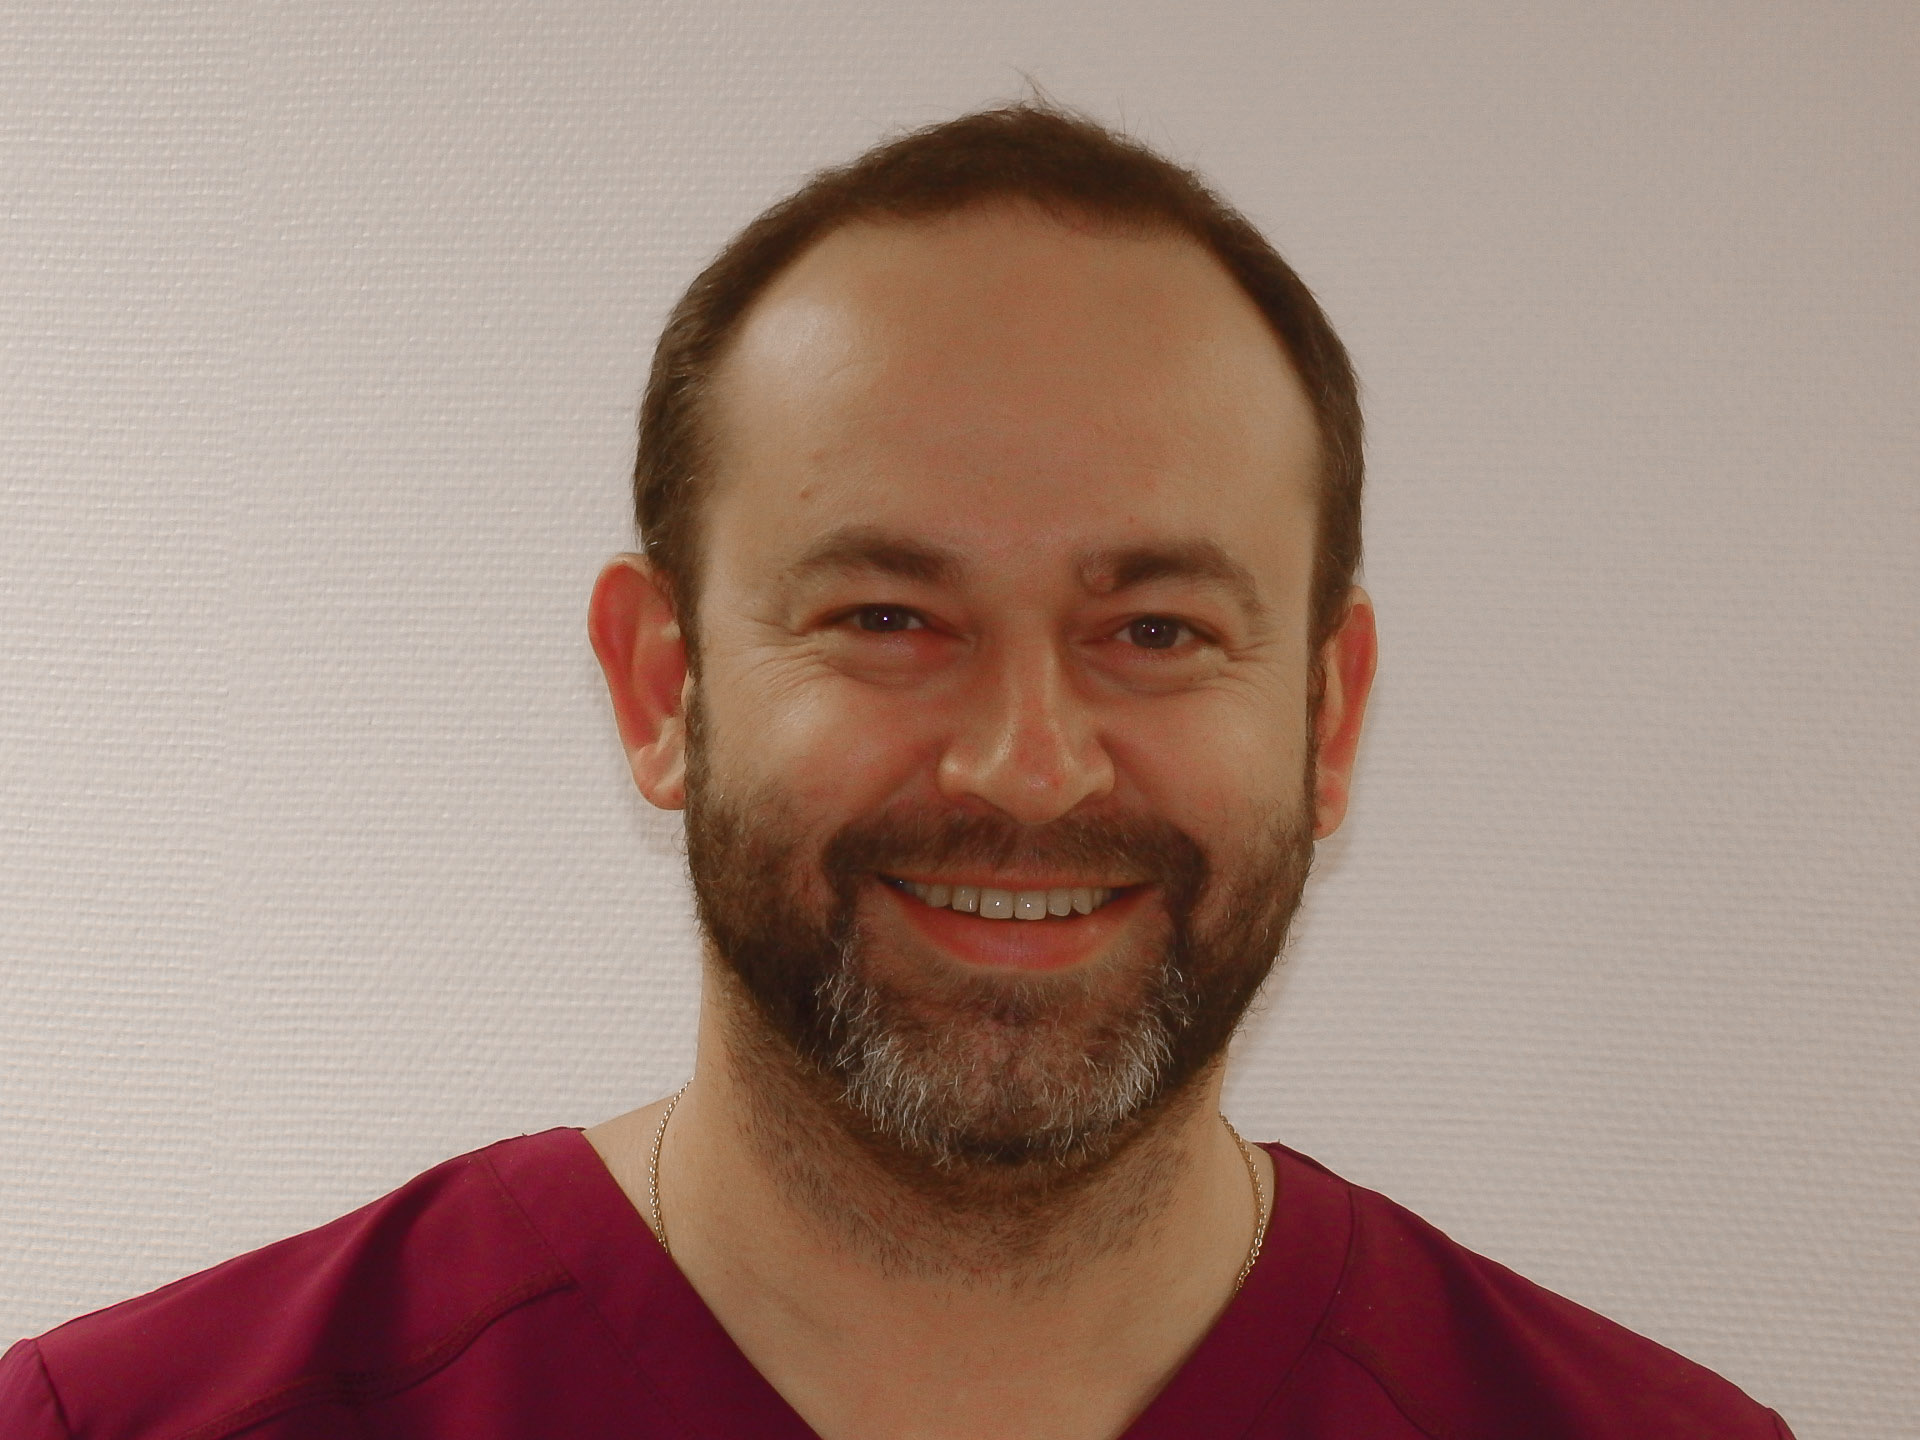 Orthodontiste WERLI Thomas